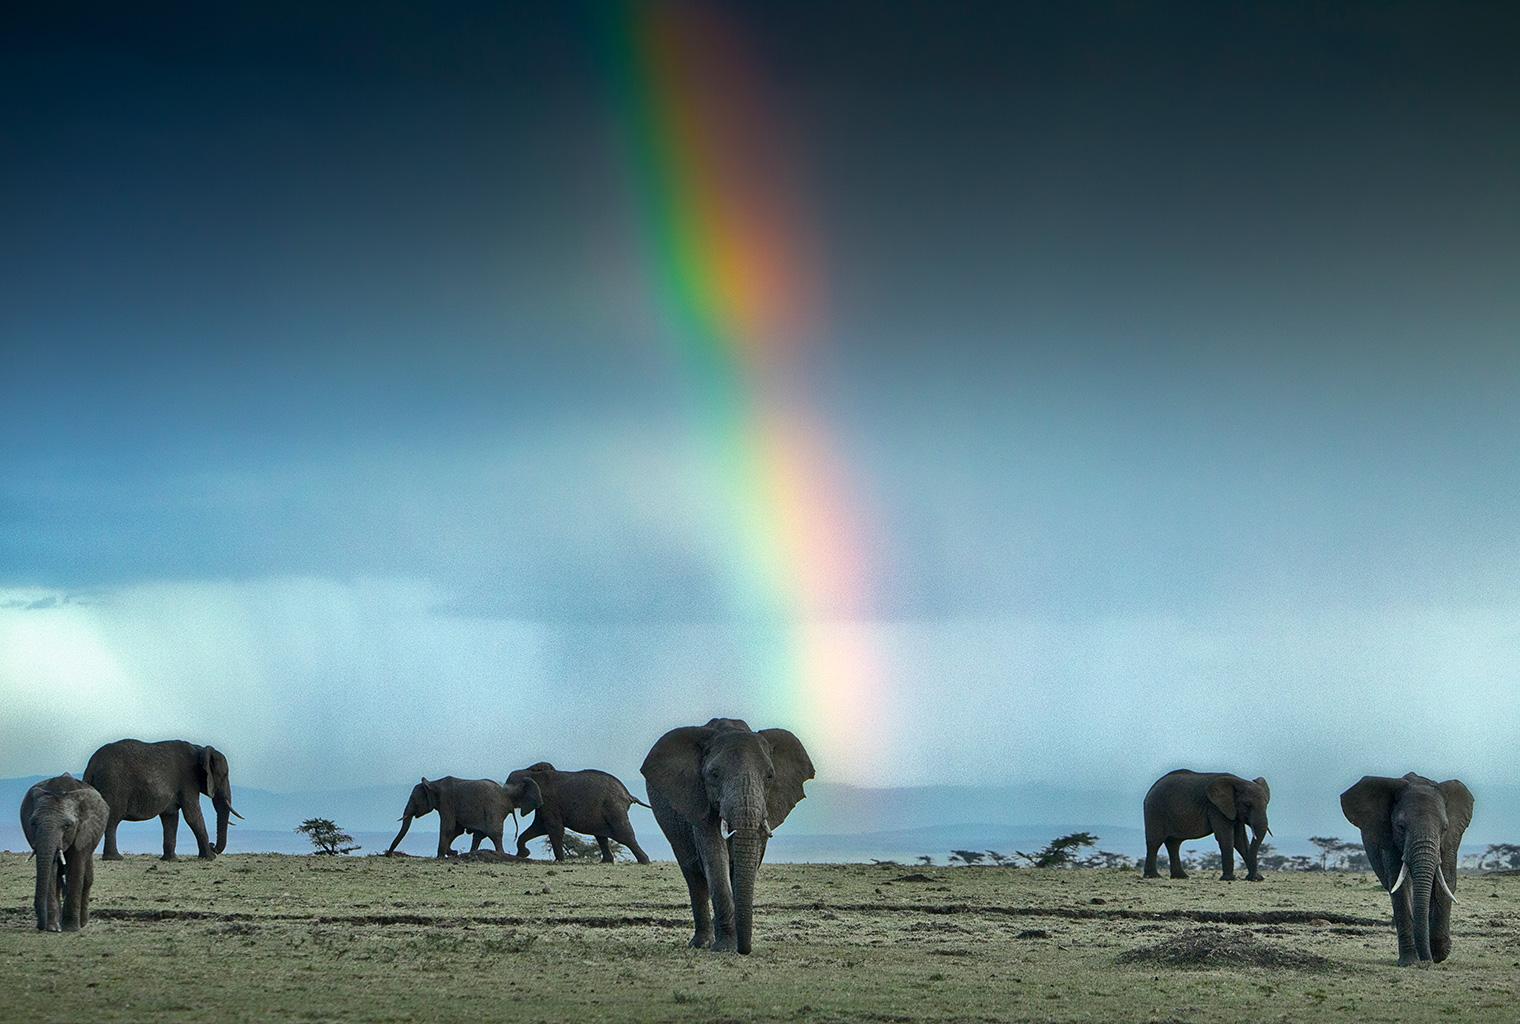 Masaai-Mara-Area-ElephantsMasaai-Mara-Area-Elephants